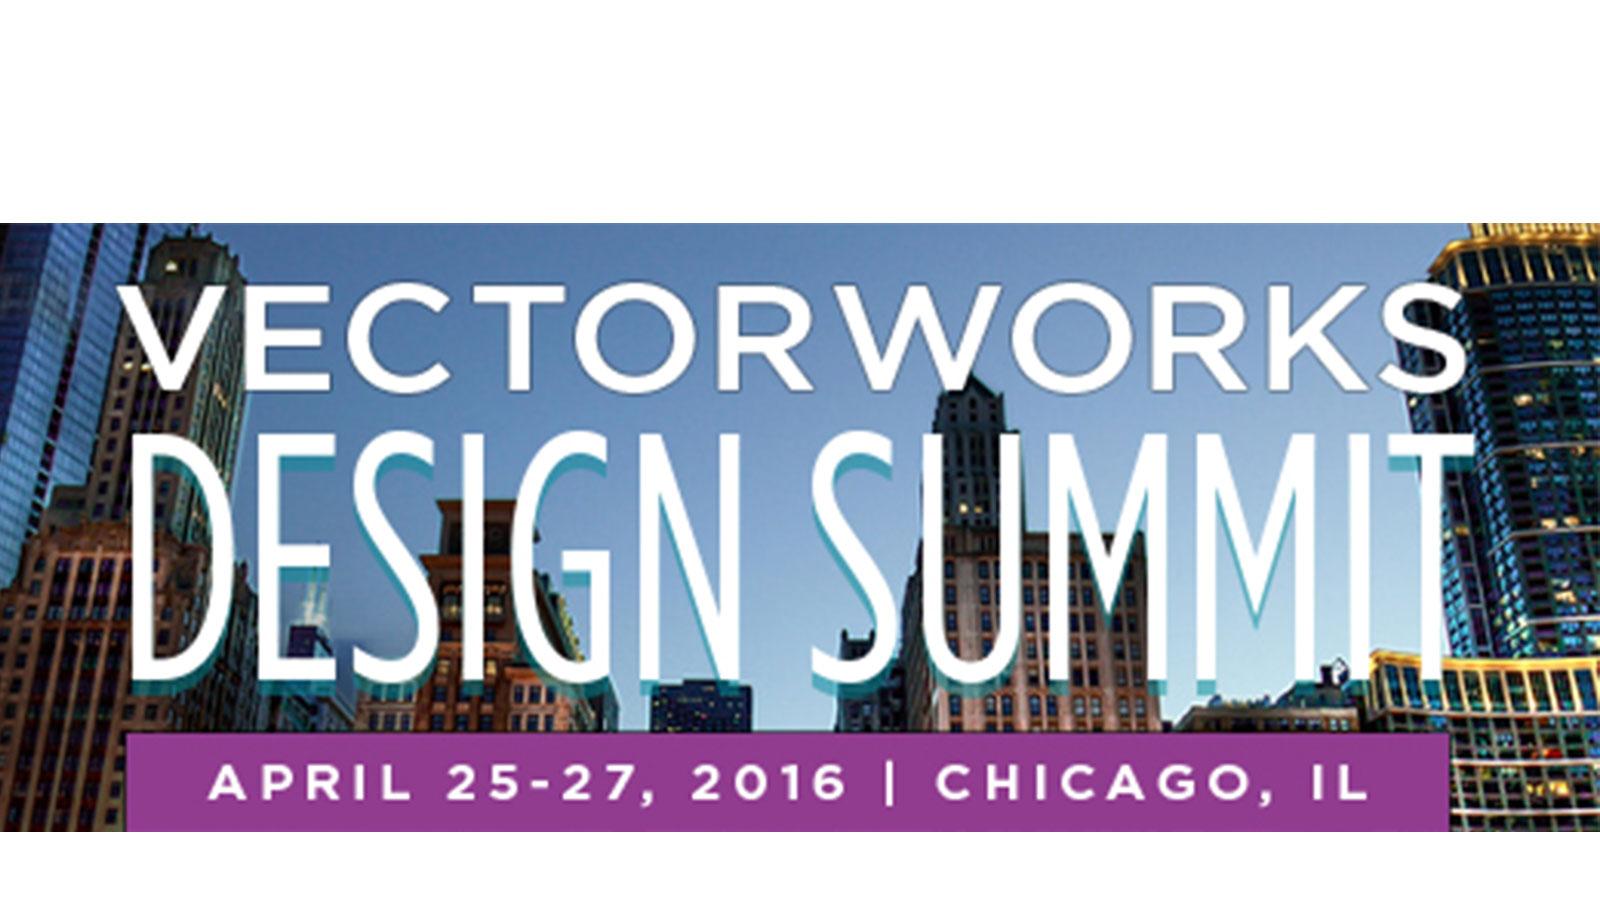 Asite are Headline sponsors of Vectorworks Design Summit, Chicago, USA.